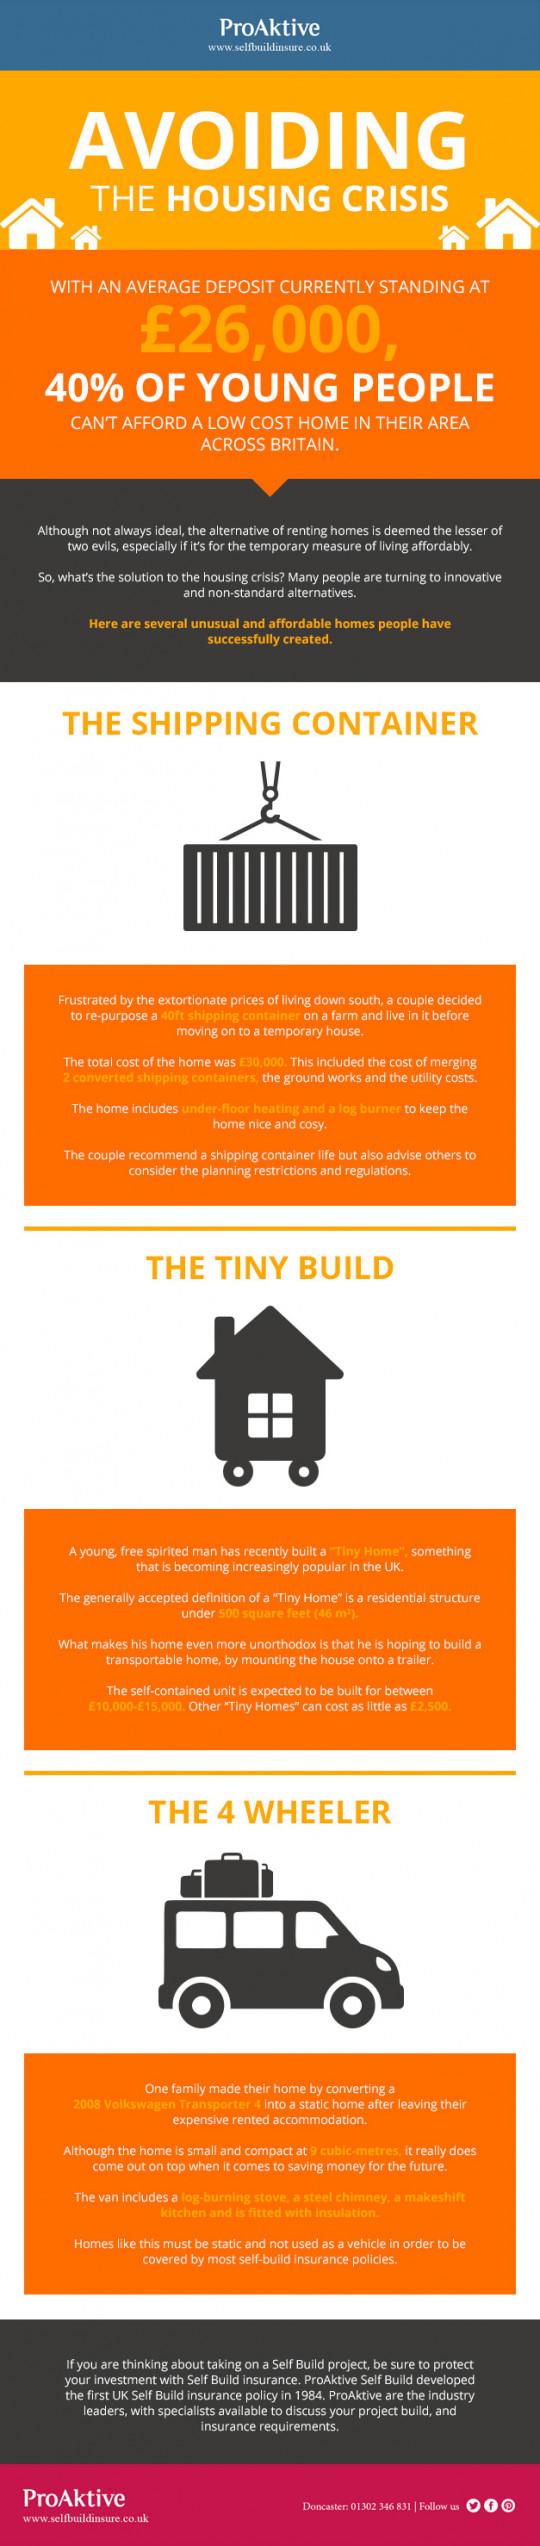 Avoiding the Housing Crisis